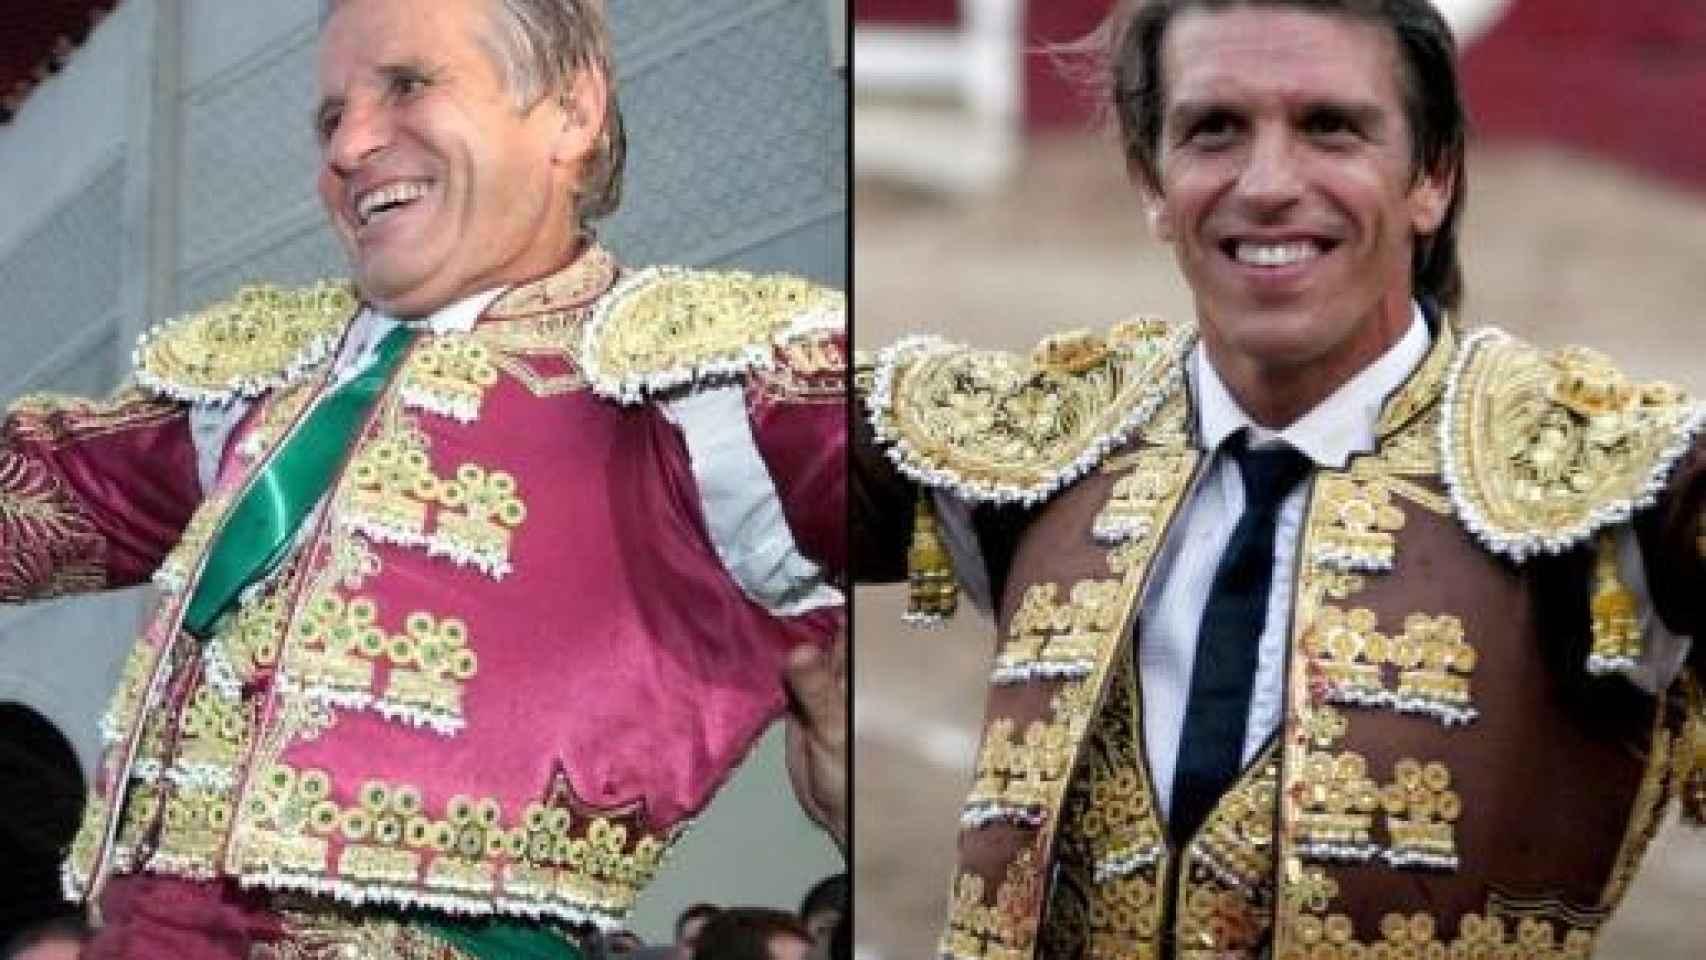 Manuel Benítez y Manuel Díaz ya son legalmente padre e hijo